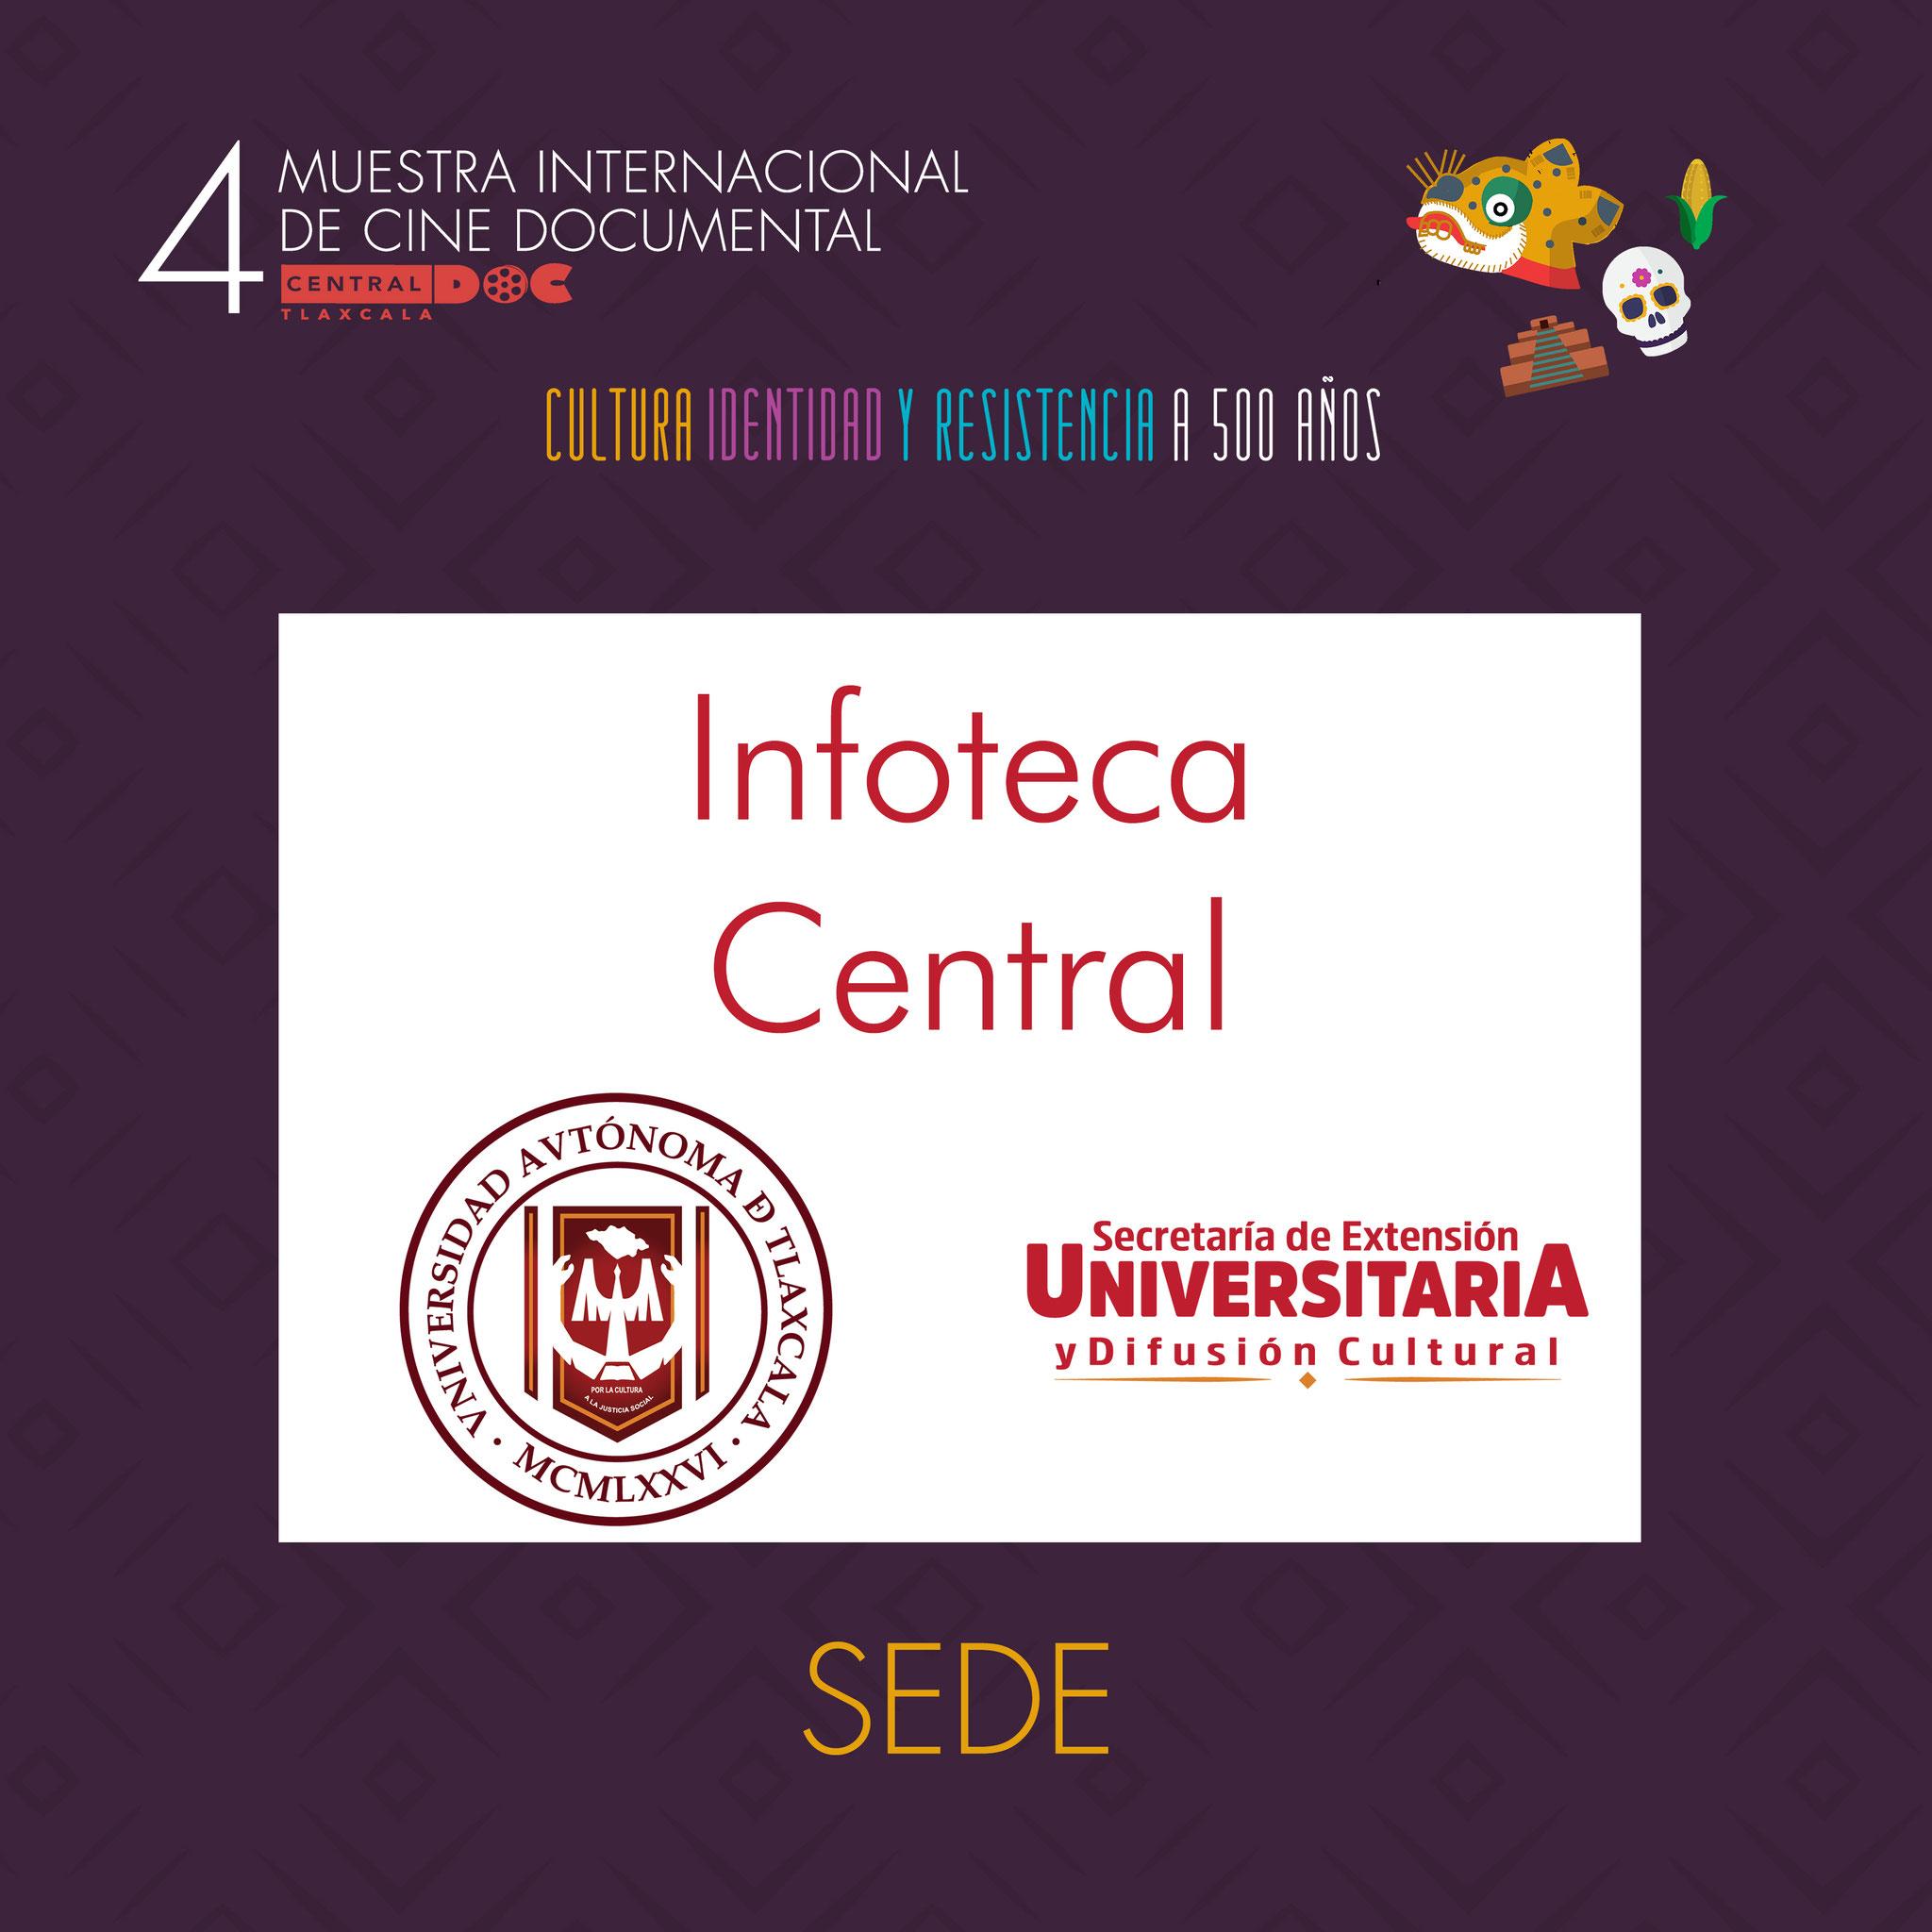 Av. Universidad Núm. 1. Col. La Loma Xicohténcatl, Tlaxcala